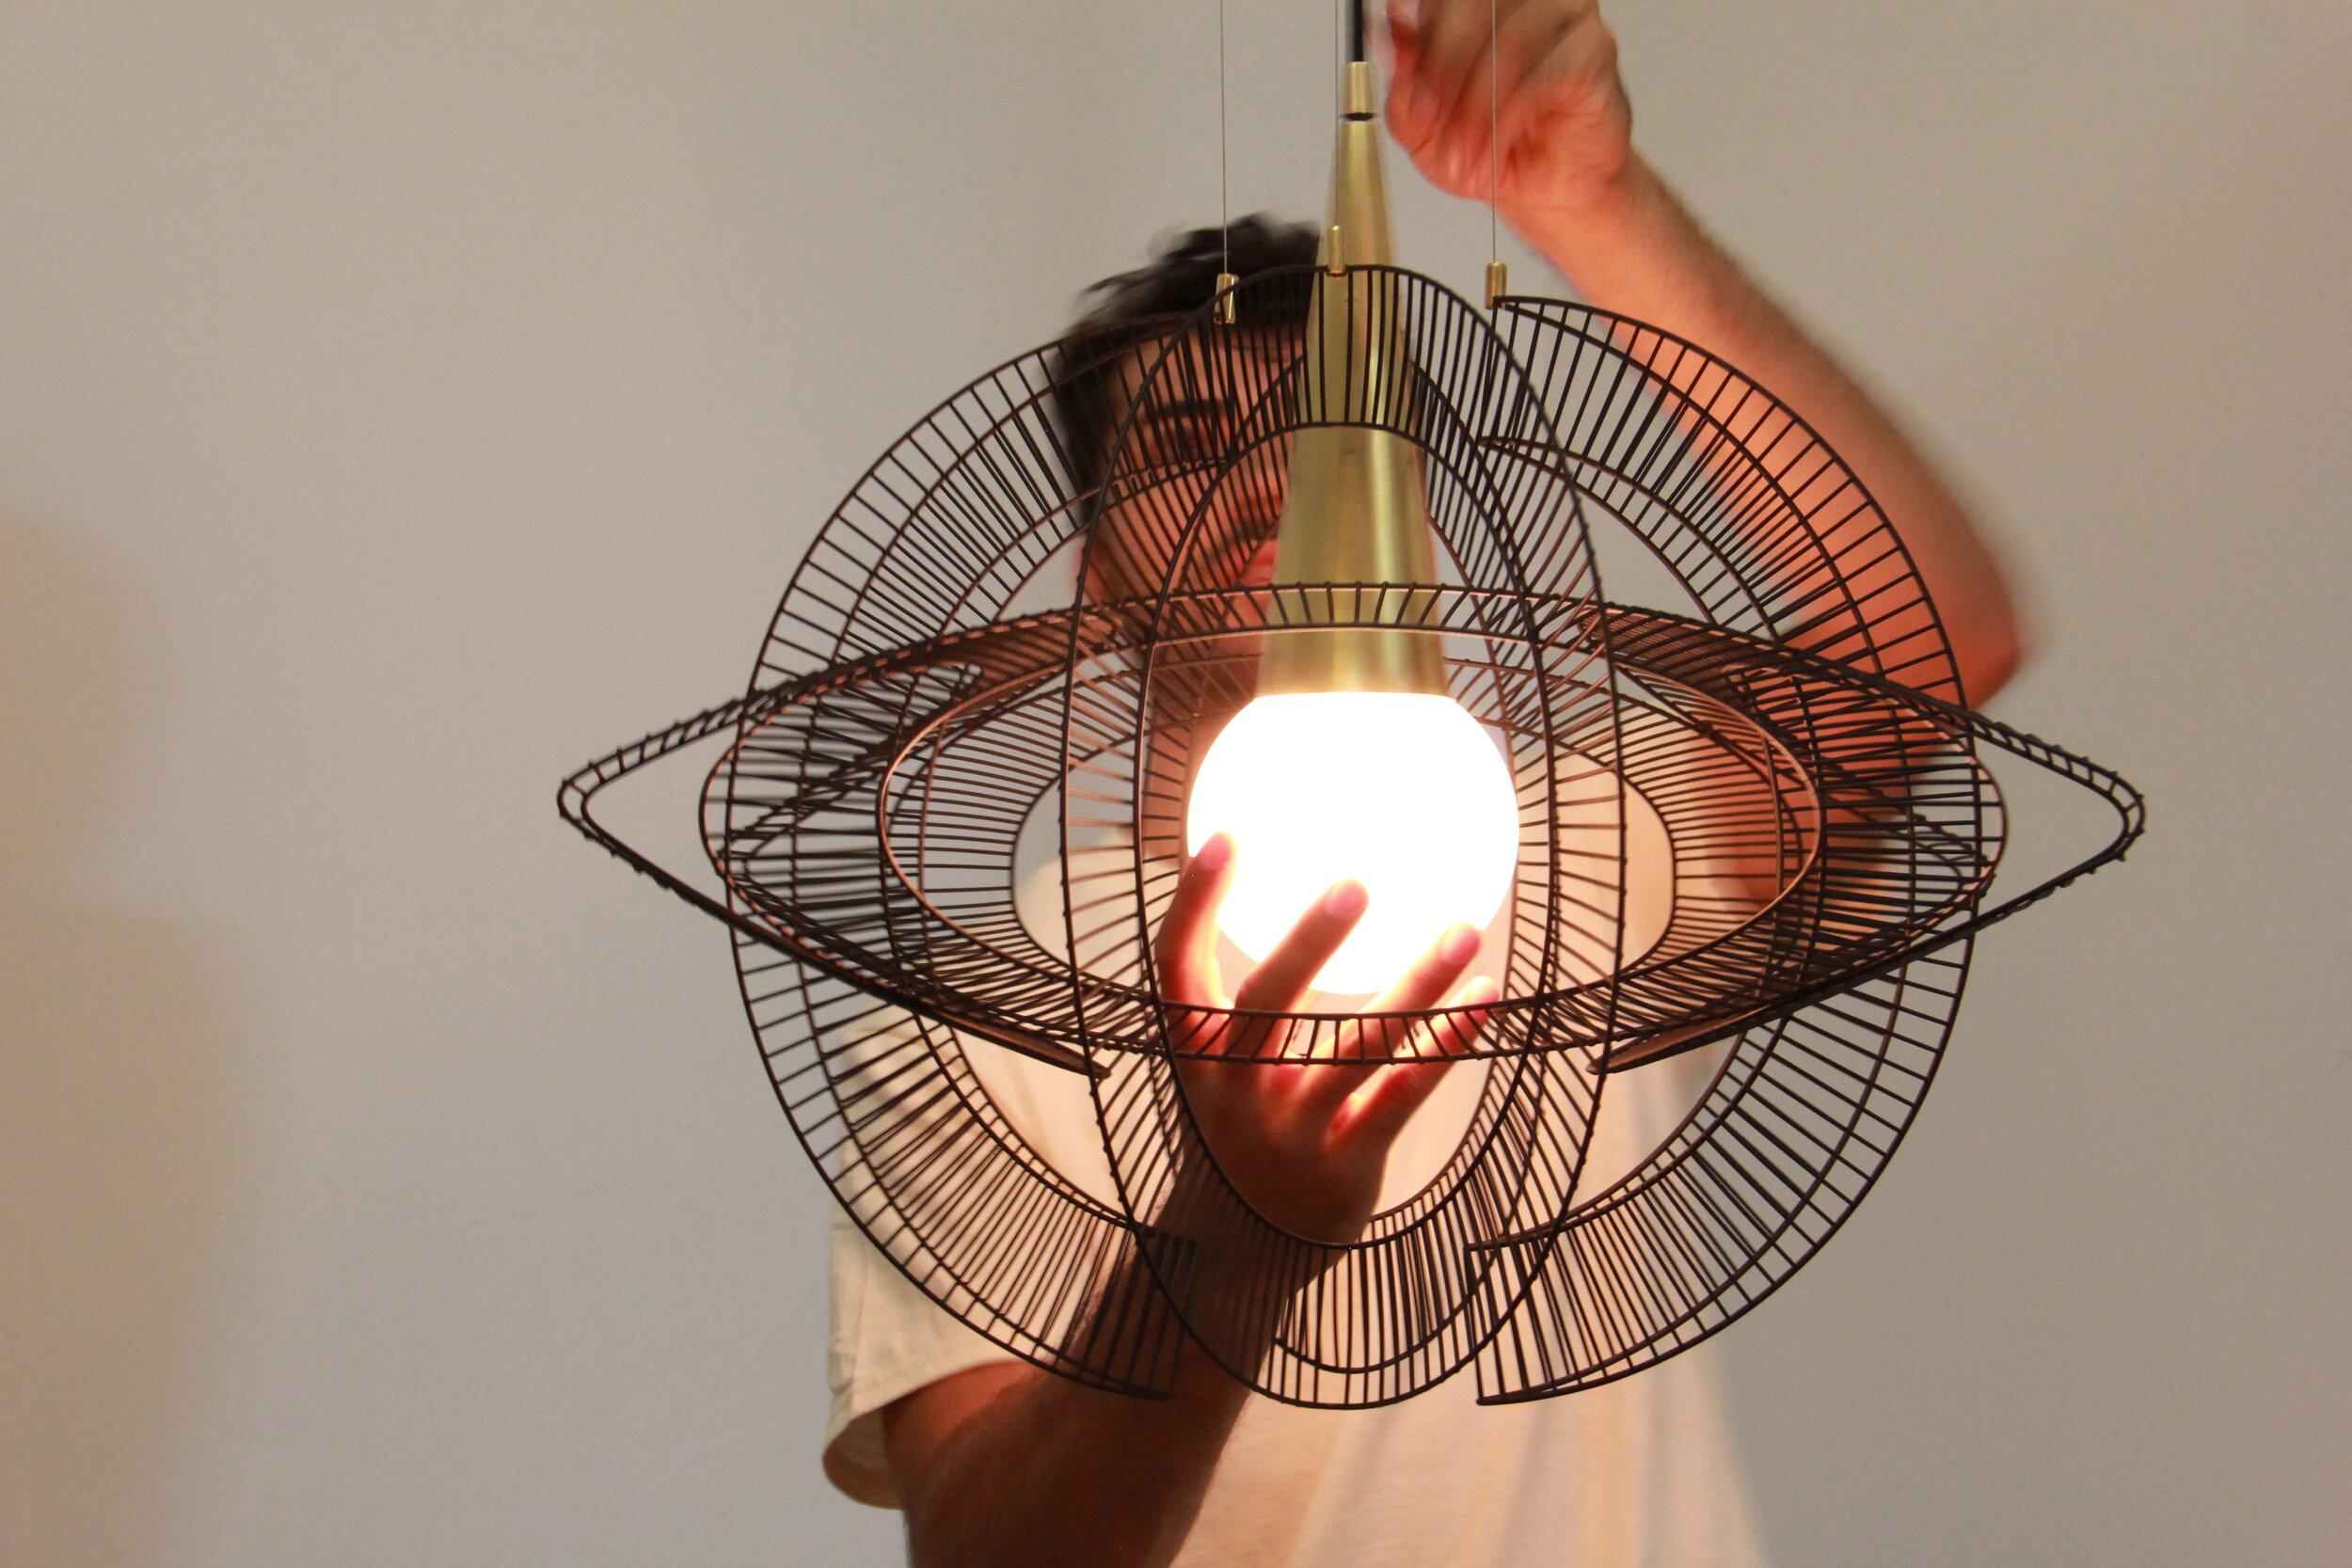 Olas_Sphera_black_brass_luminaire_design_lampe_lamp_studio-botte_artisan.JPG